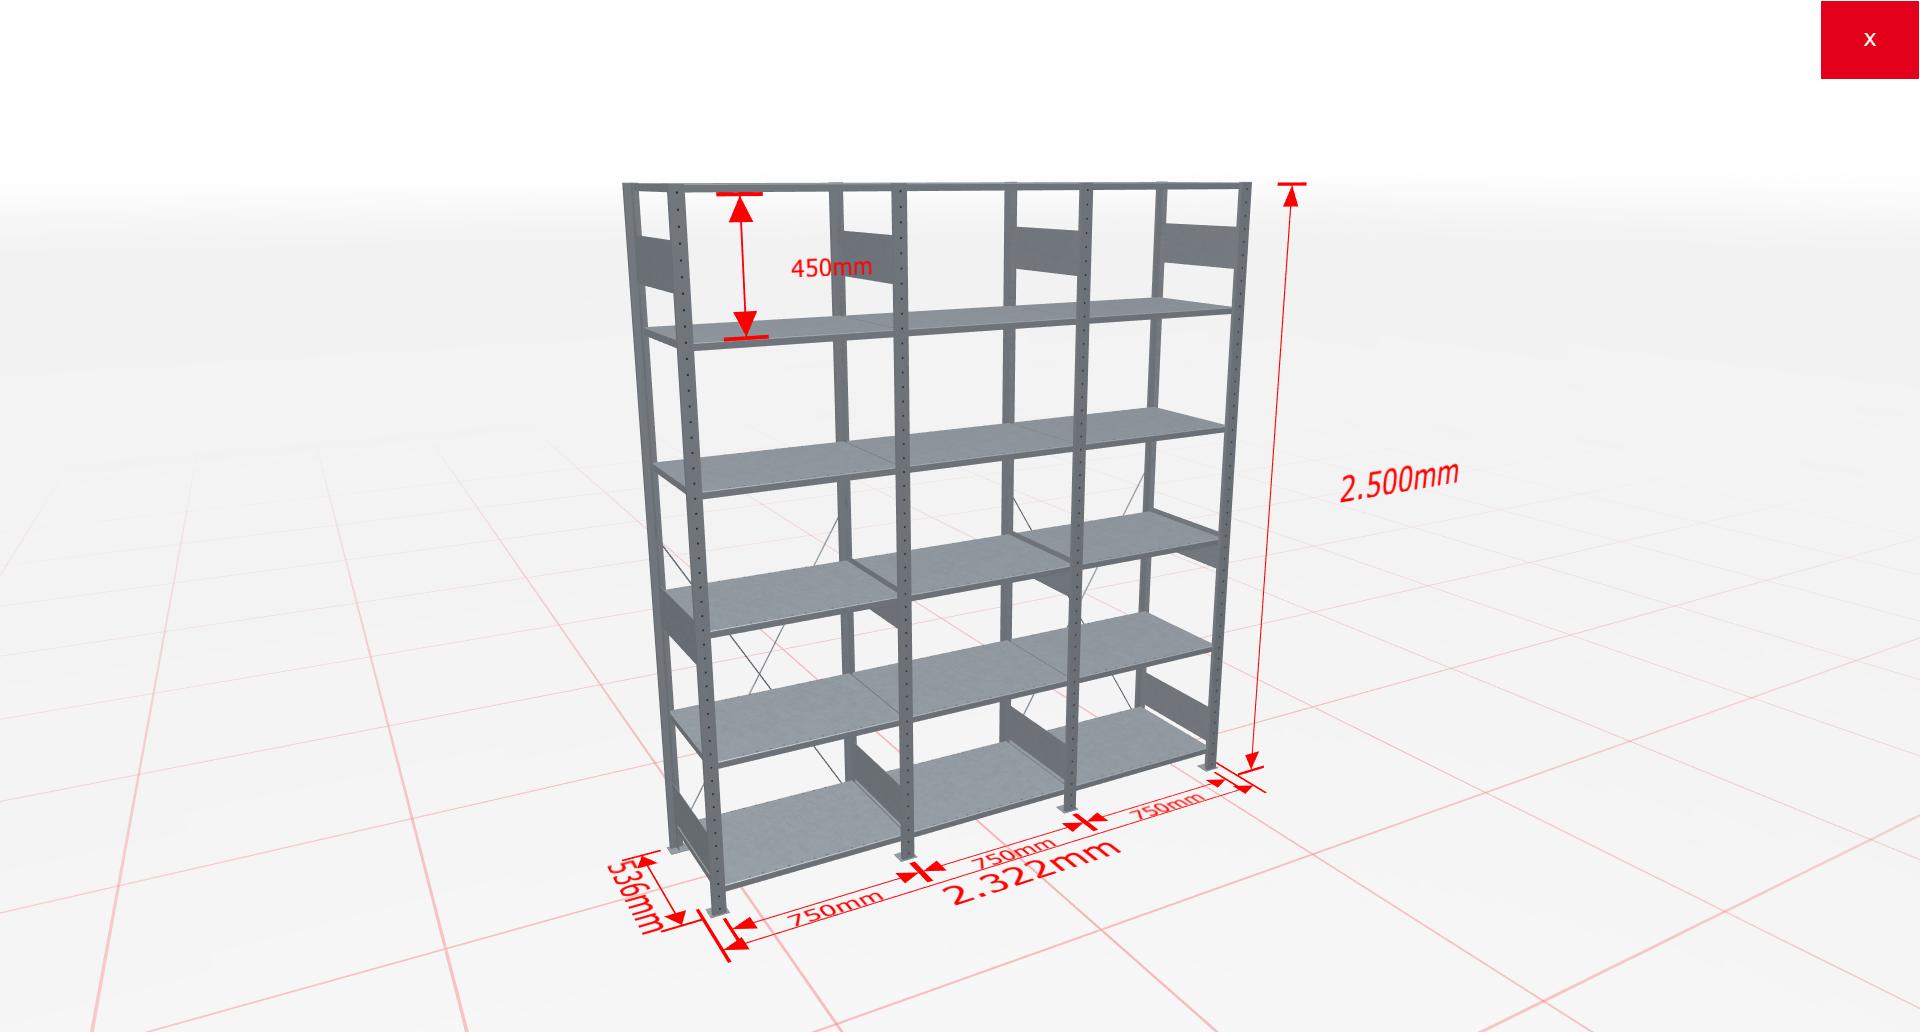 Fachbodenregal Komplettregal 2500x2322x500 mm (HxBxT) SCHULTE Lagertechnik verzinkt 6 Ebenen  150 kg je Boden